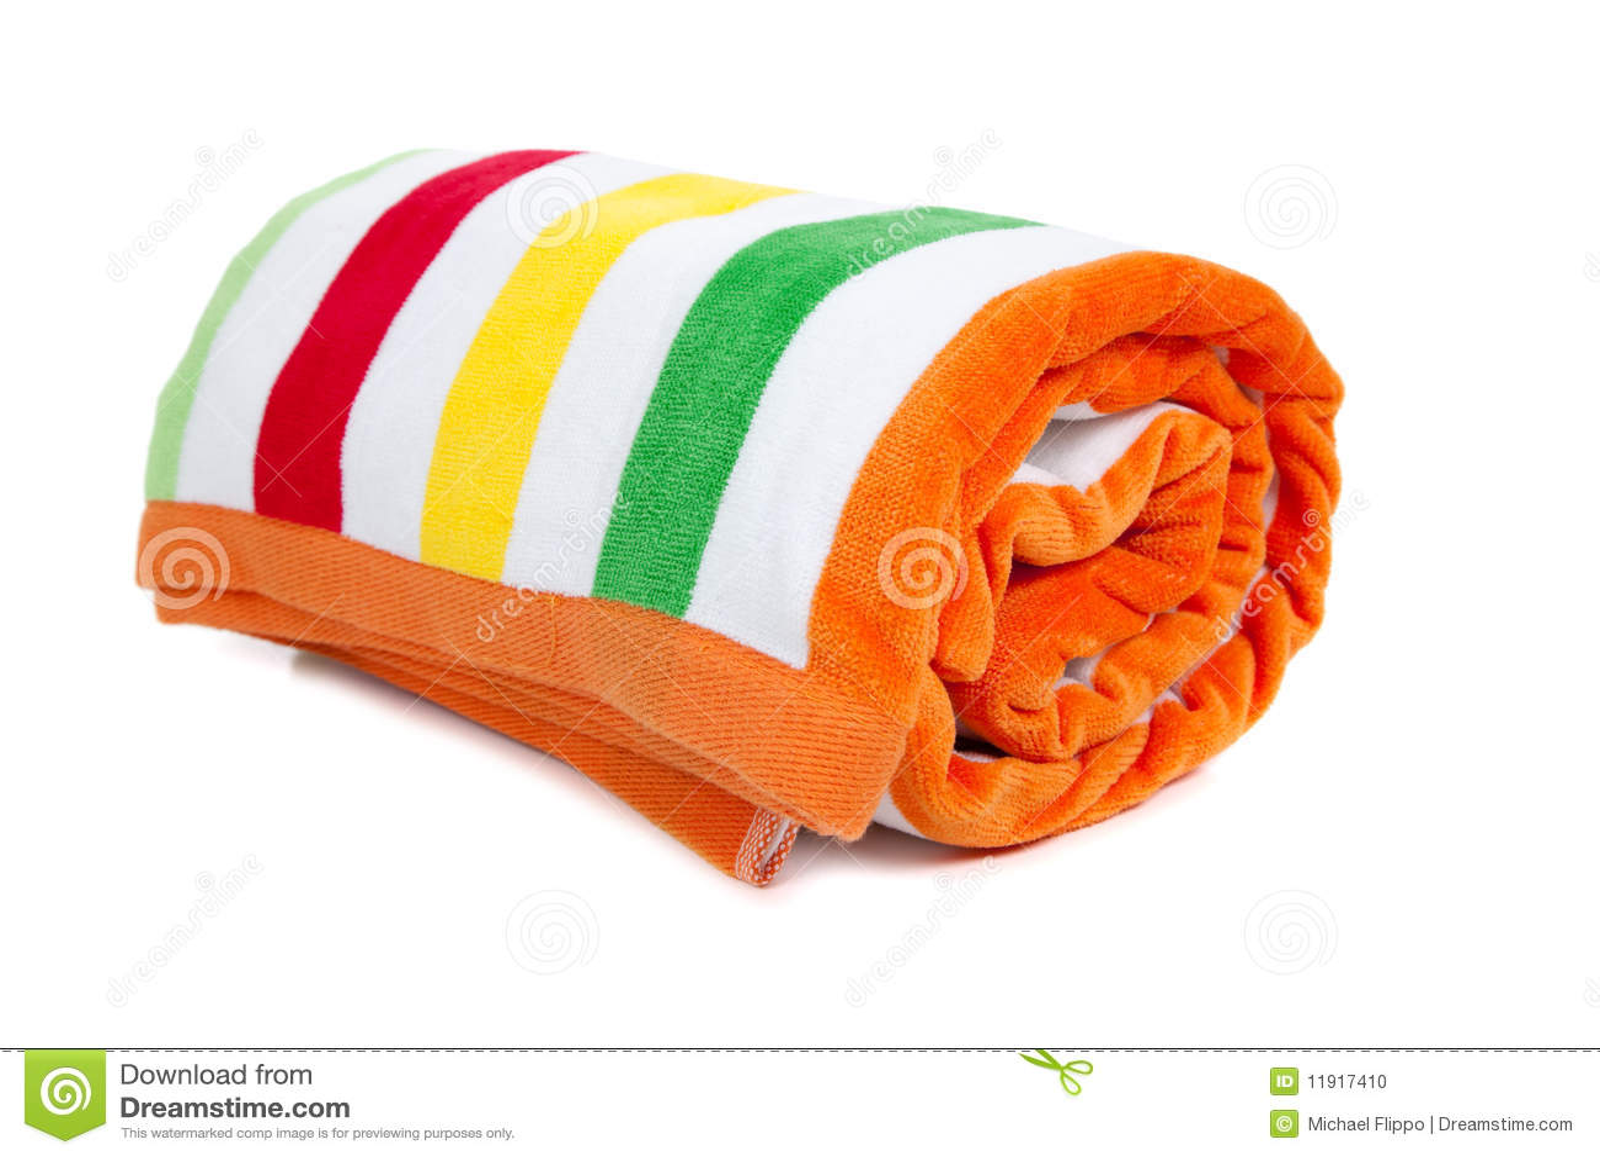 Striped beach towel on white